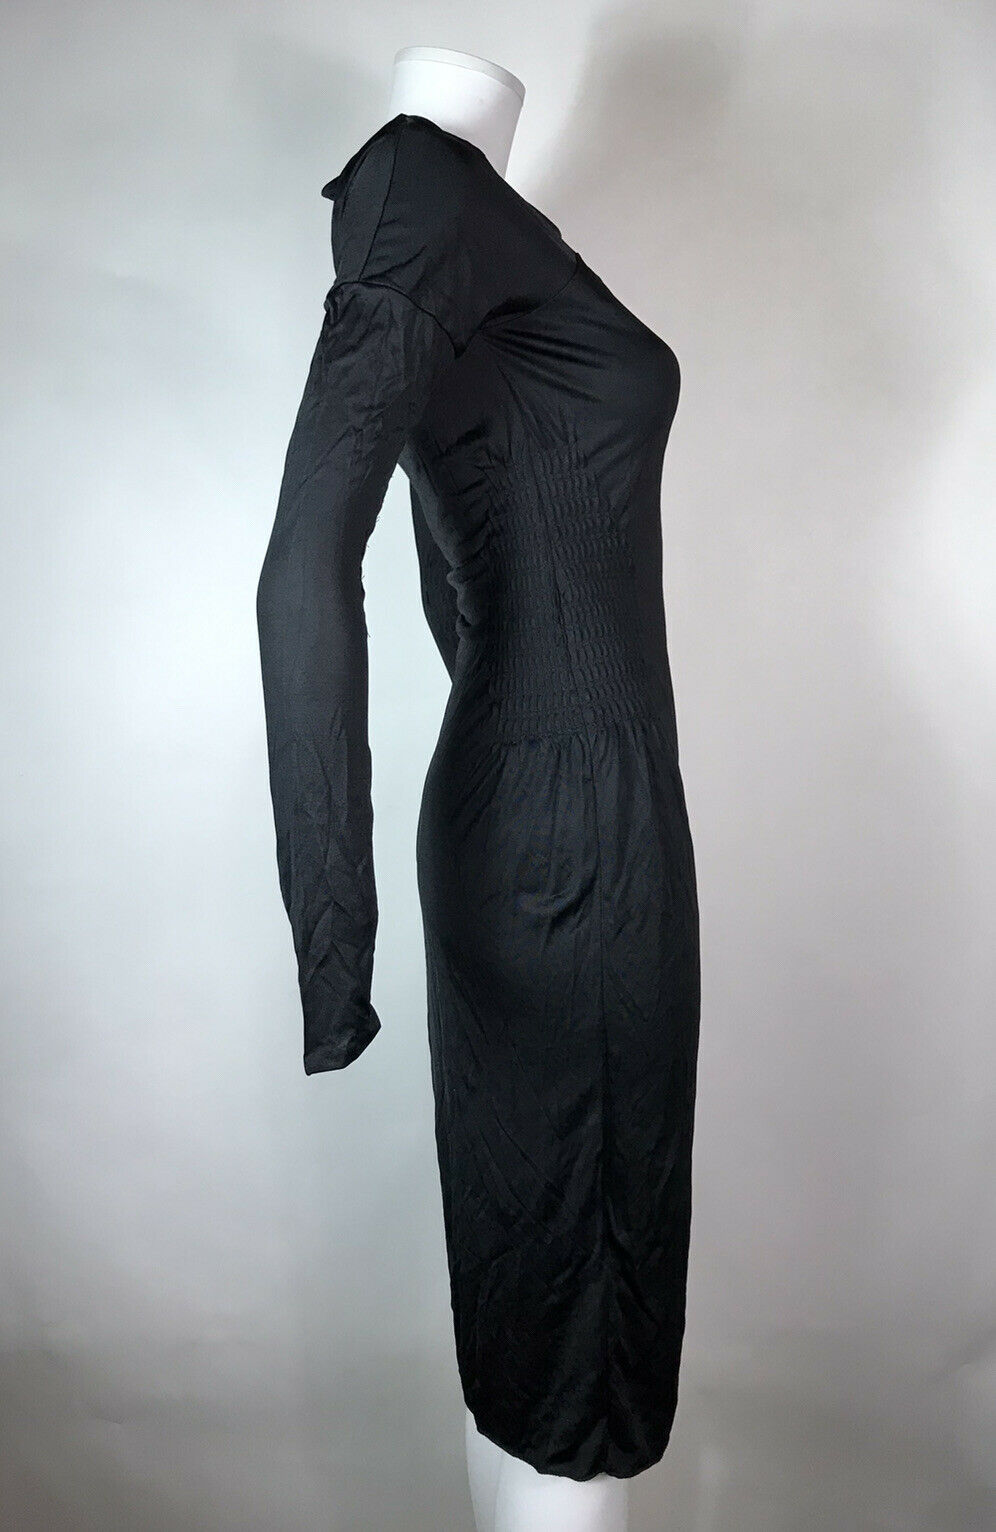 Rare Vtg Gucci Black Cut Out Dress S - image 4